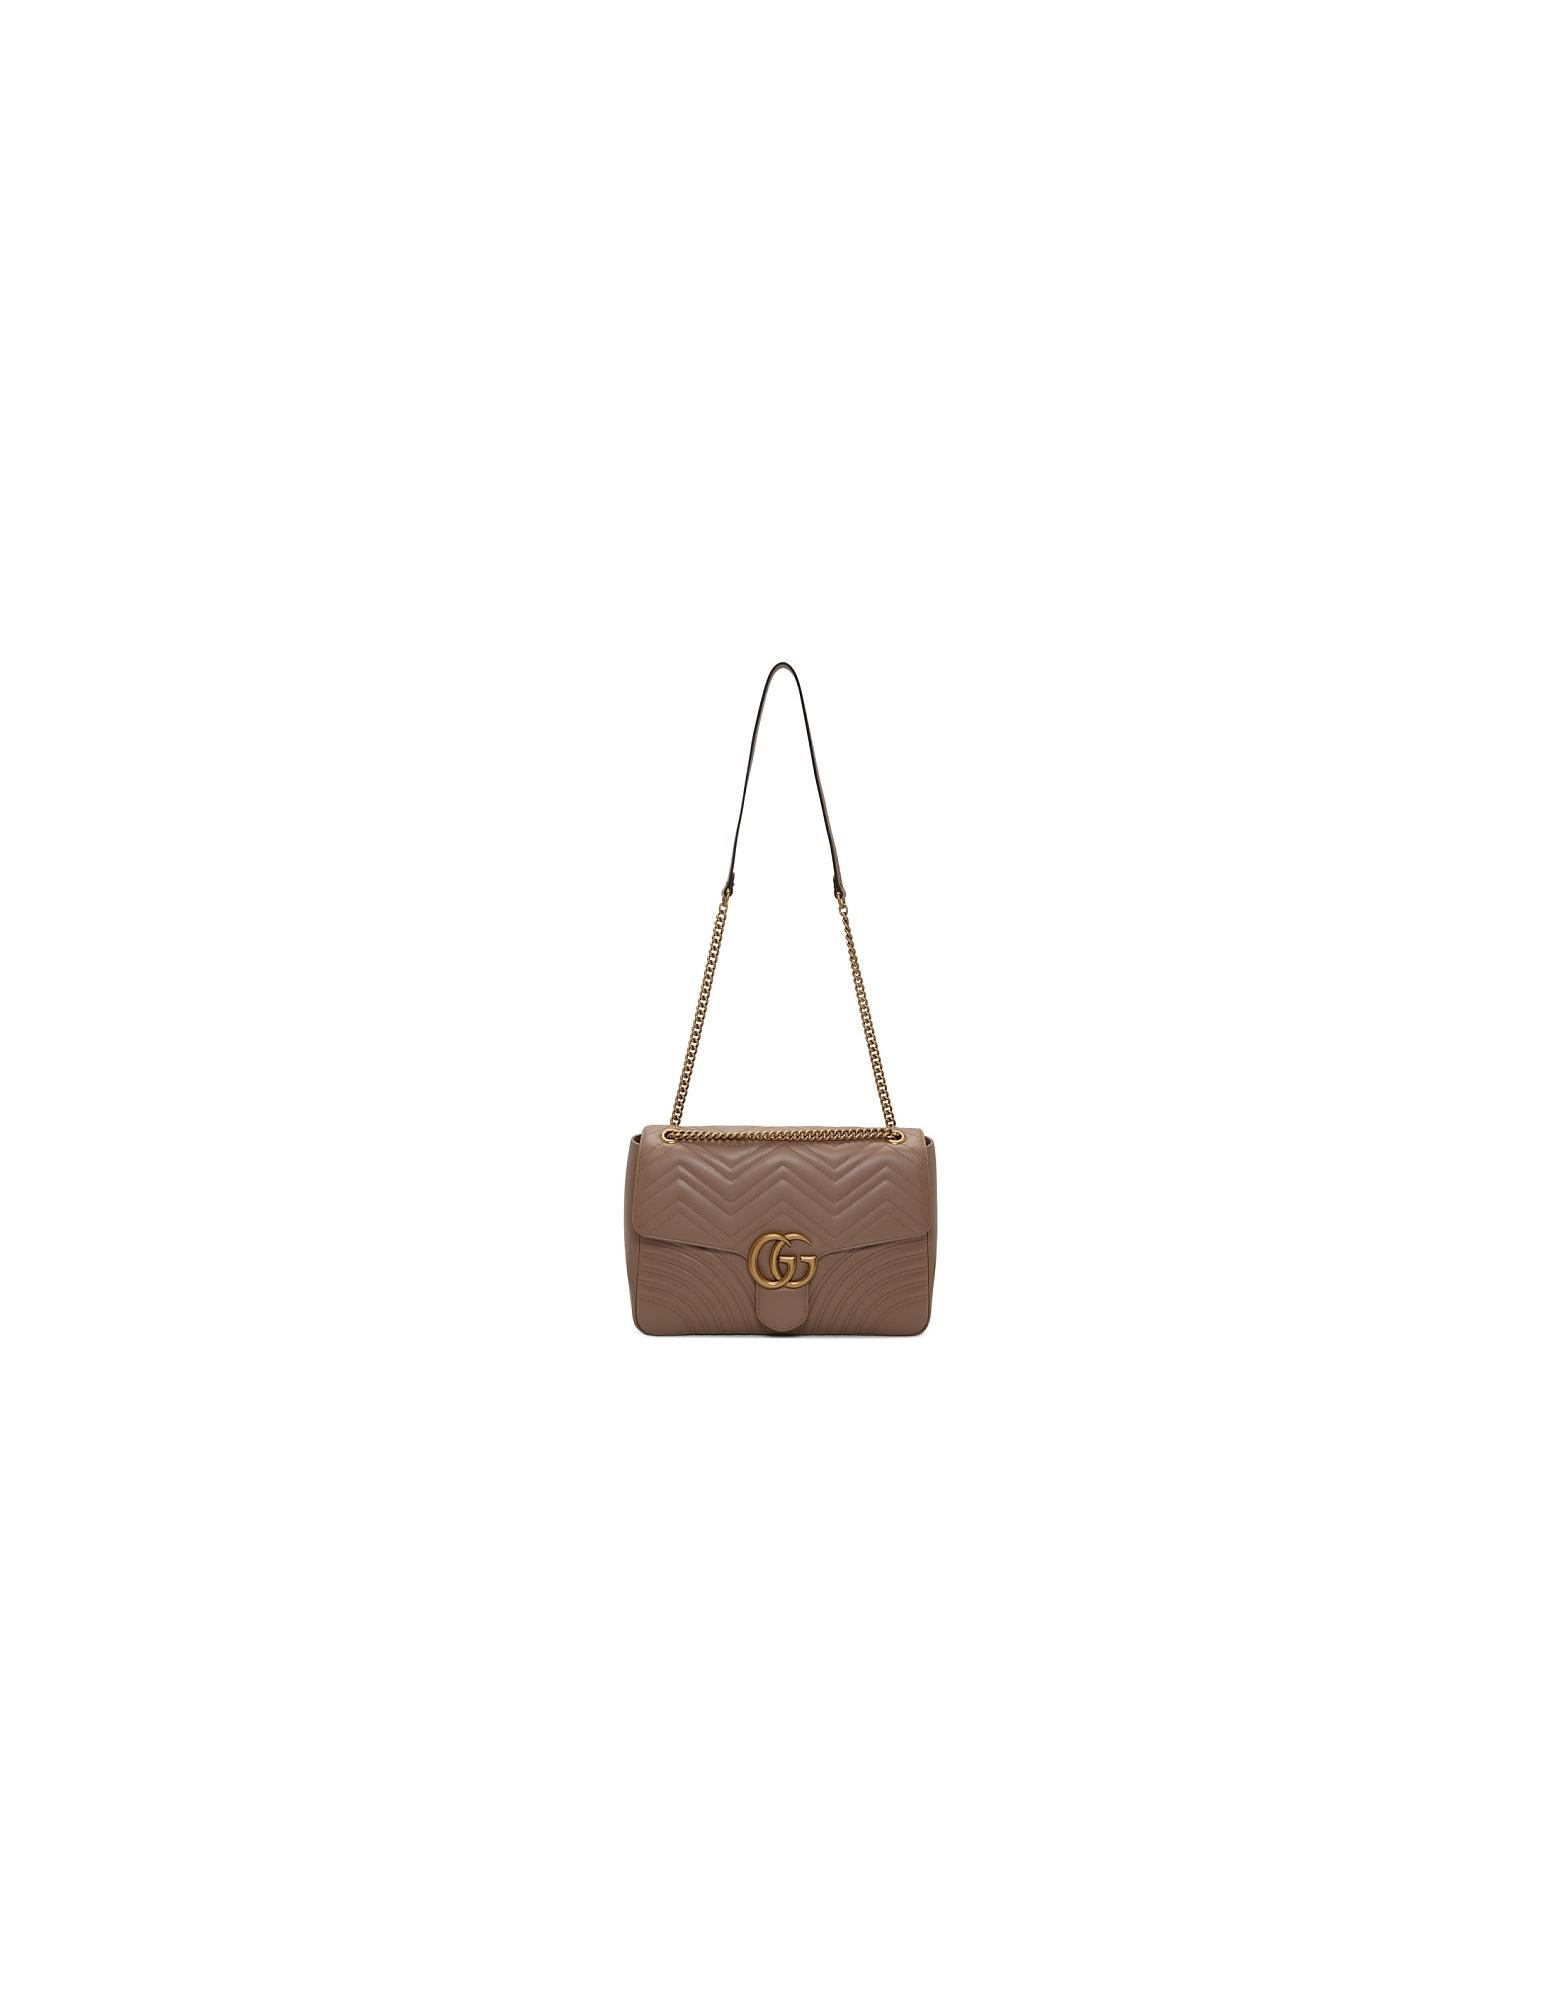 Gucci Designer Handbags, Pink Large GG Marmont 2.0 Bag